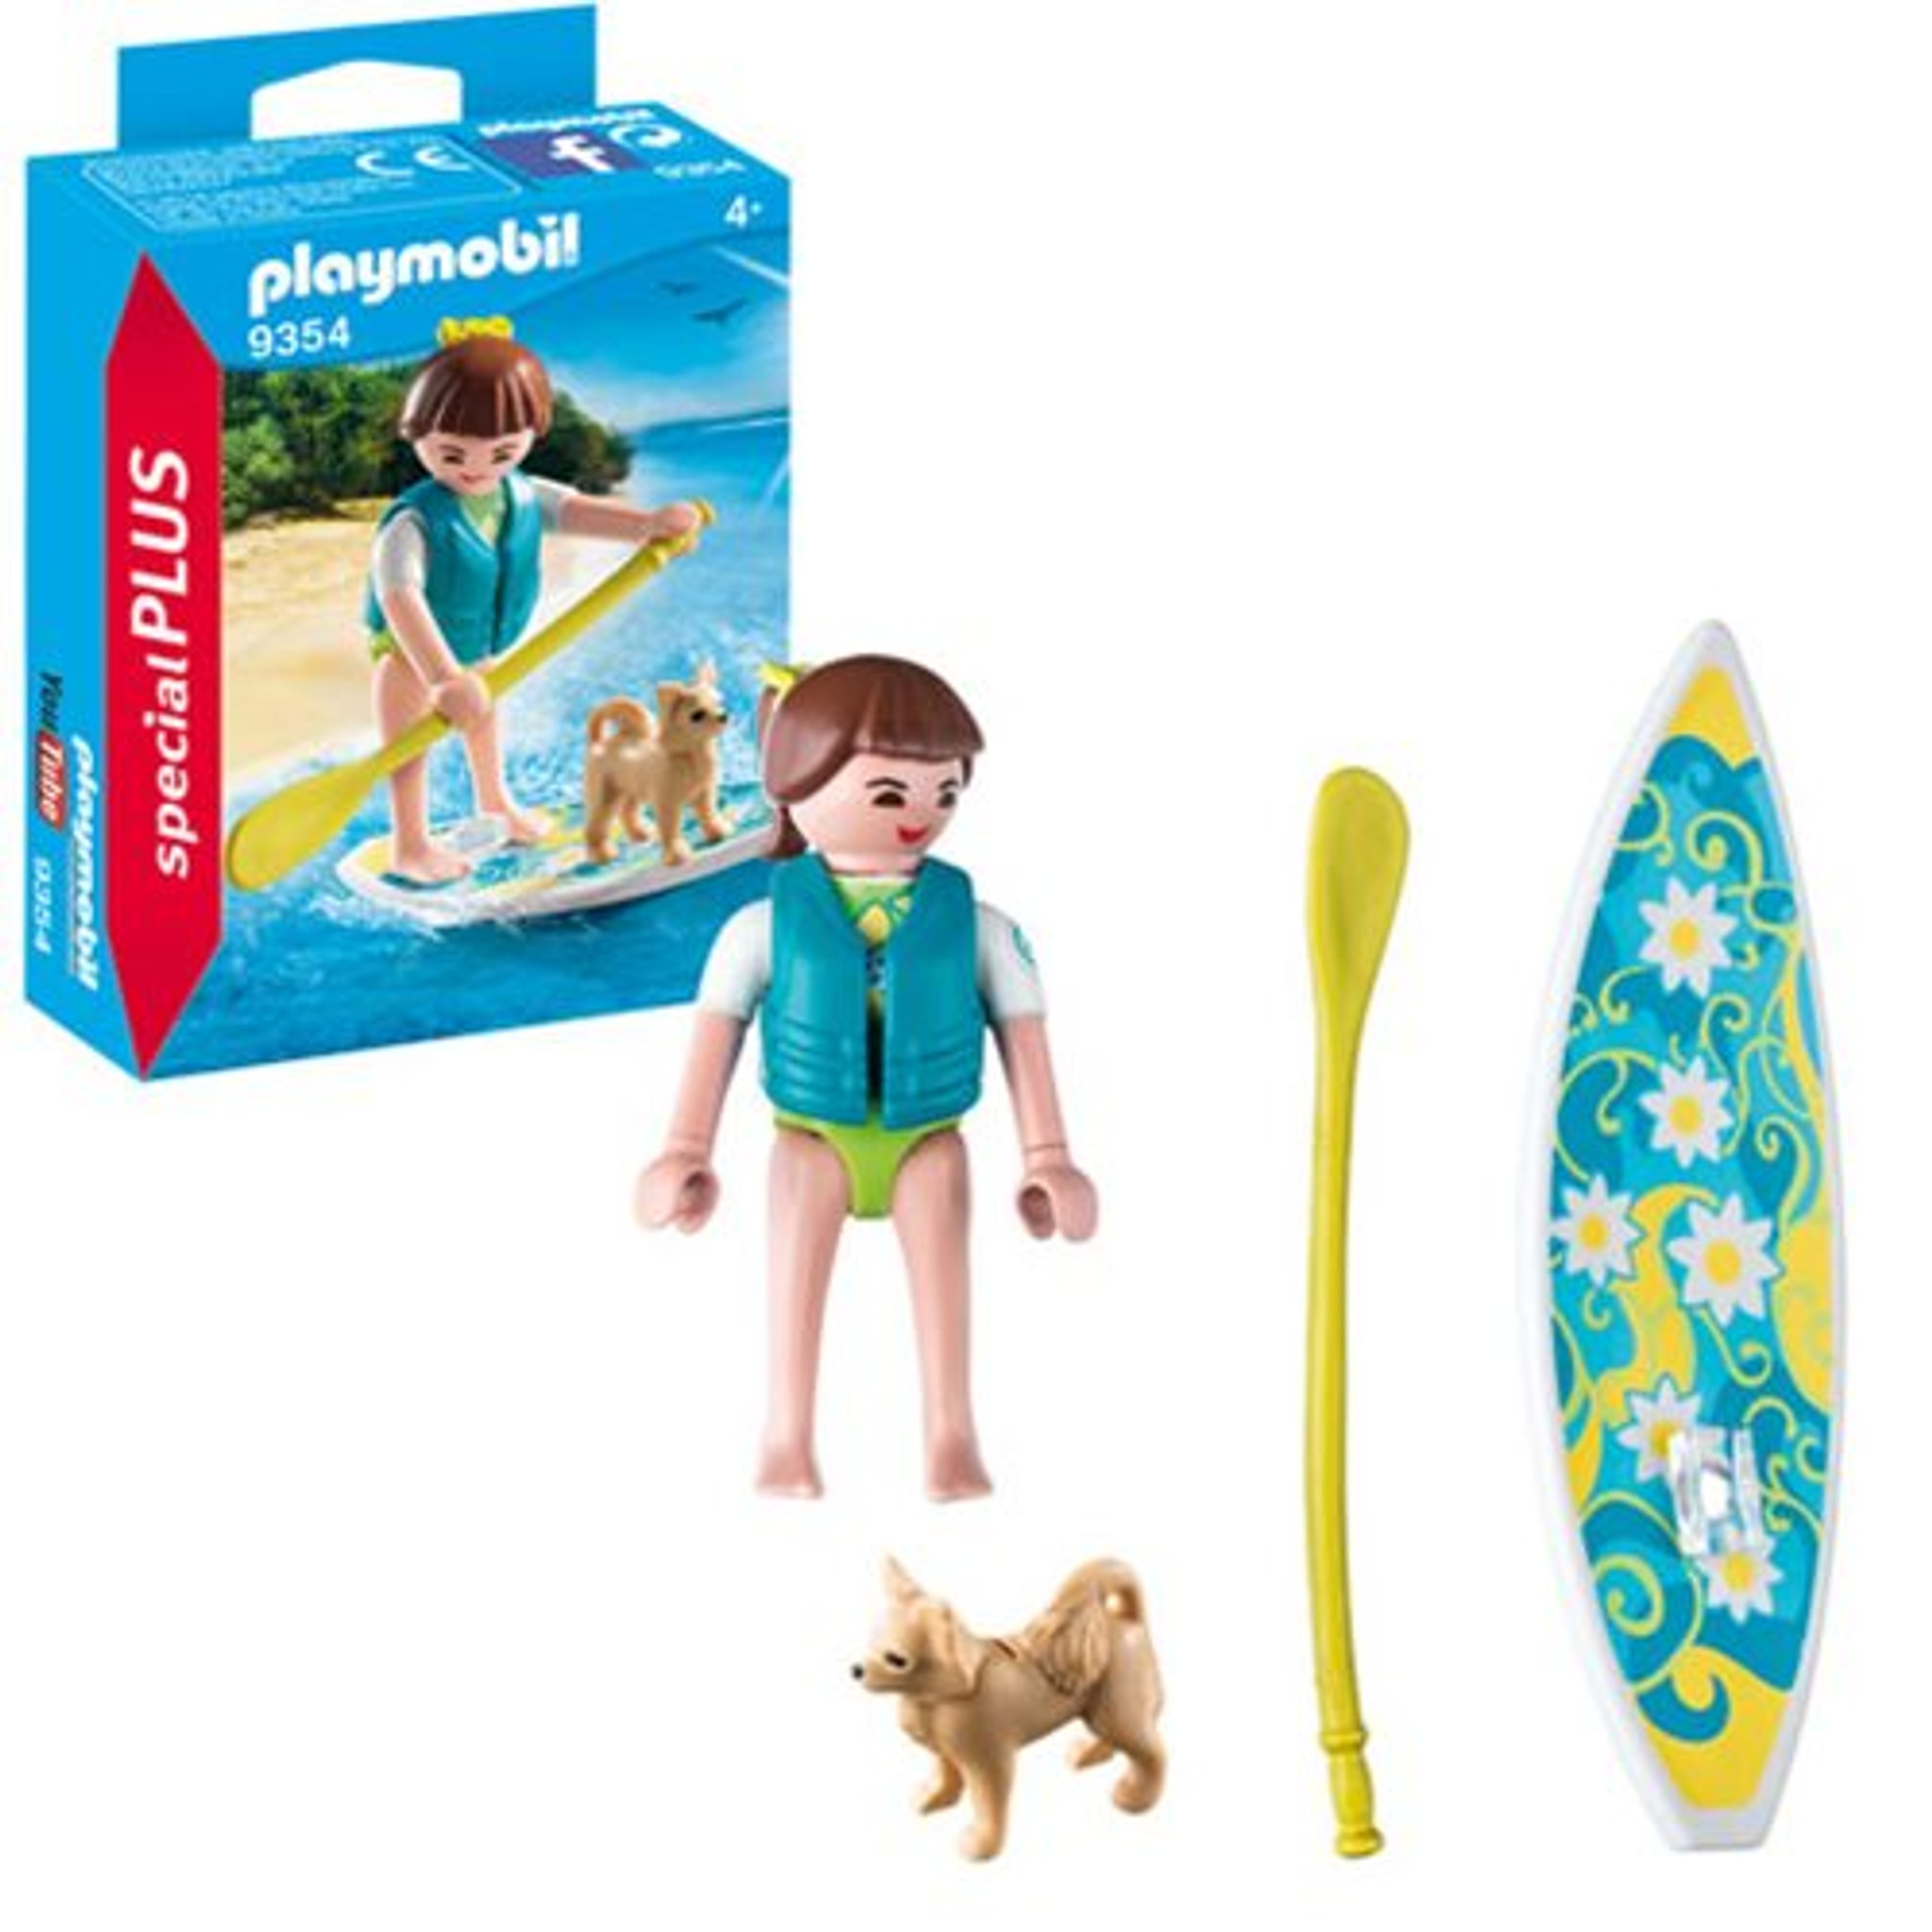 Summer Water Fun PLAYMOBIL Figure S350 Male Boater w// Life Jacket